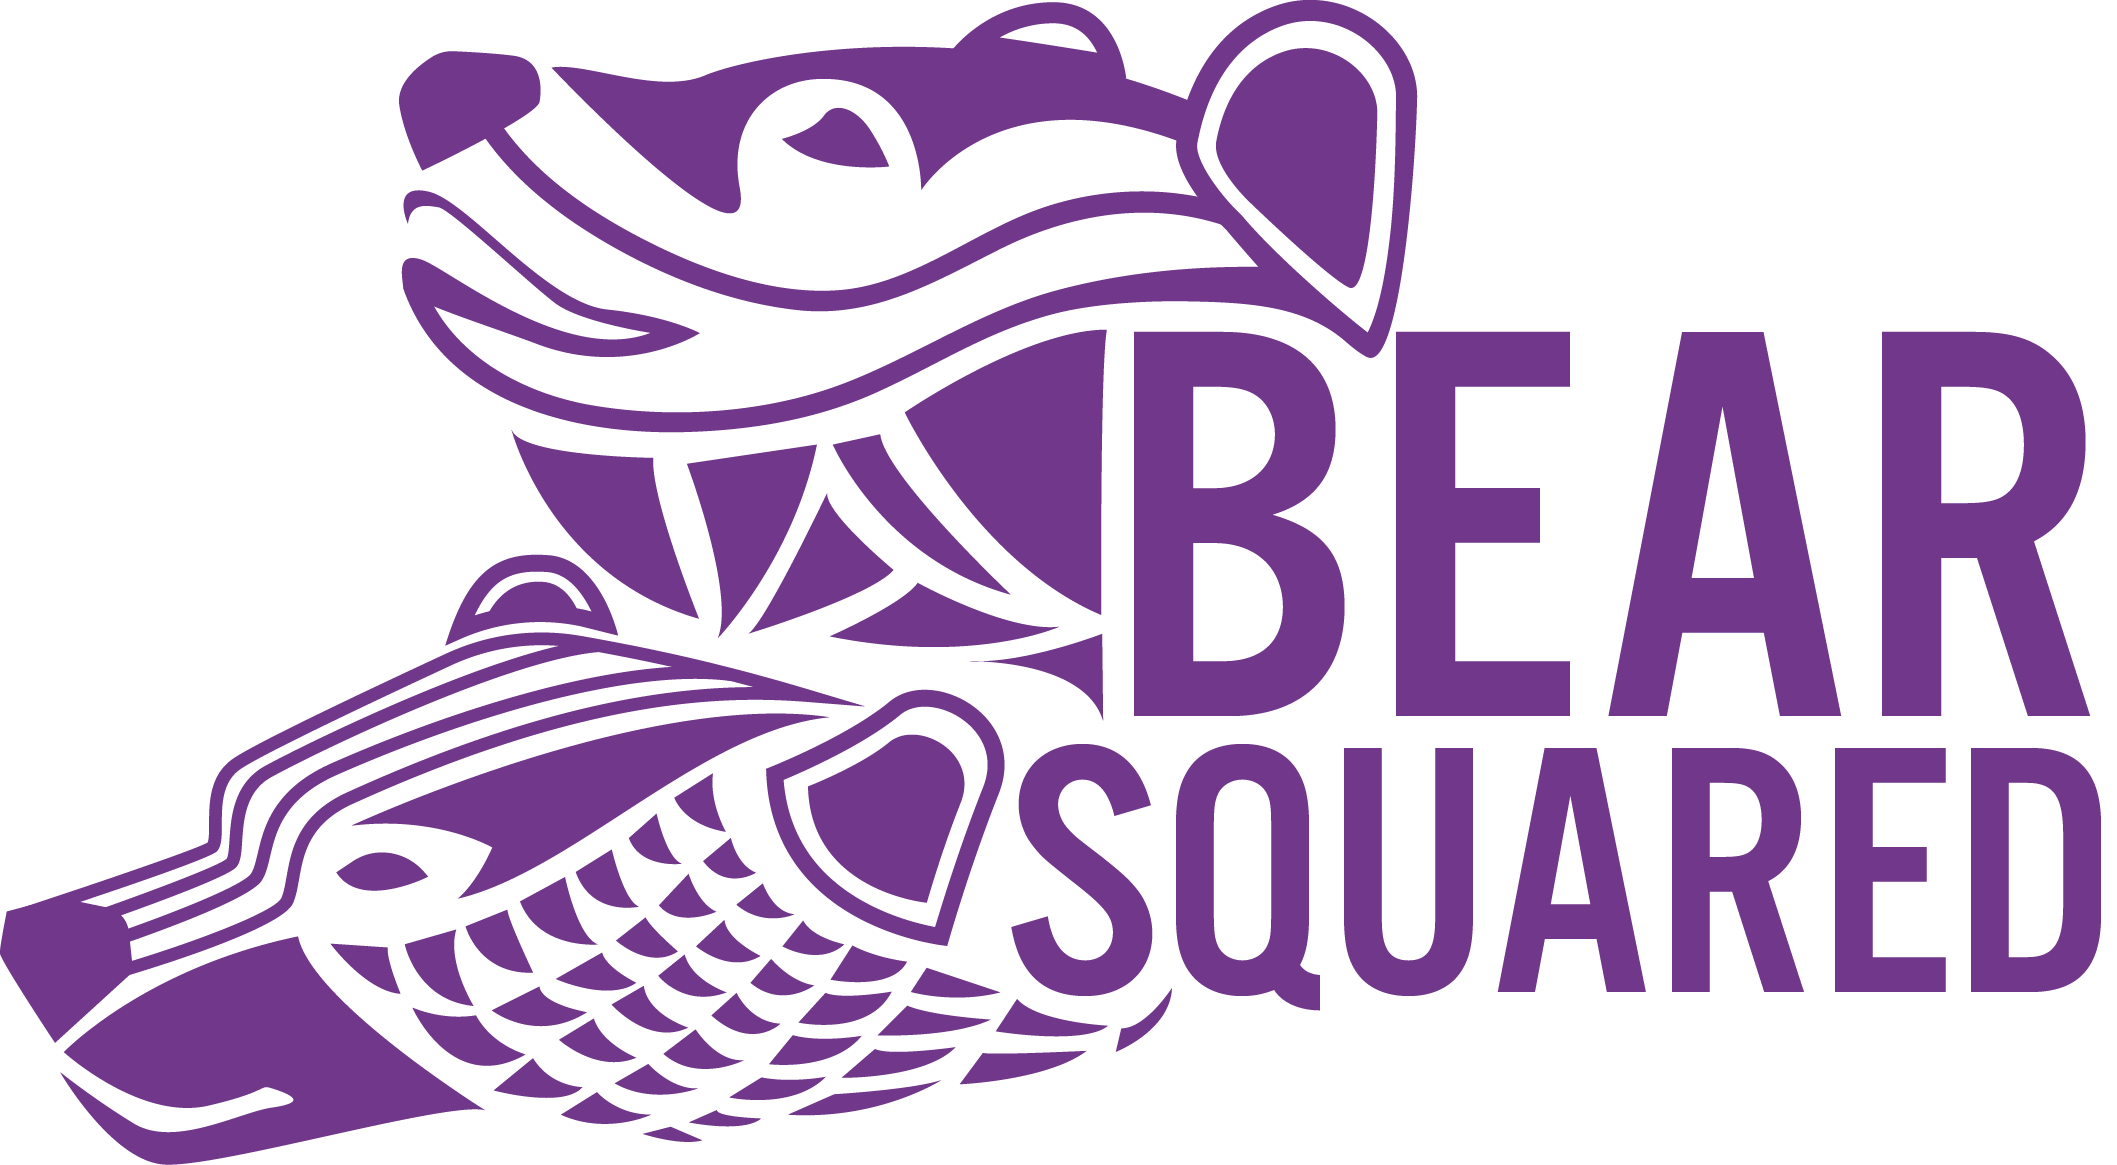 BearSquared.net